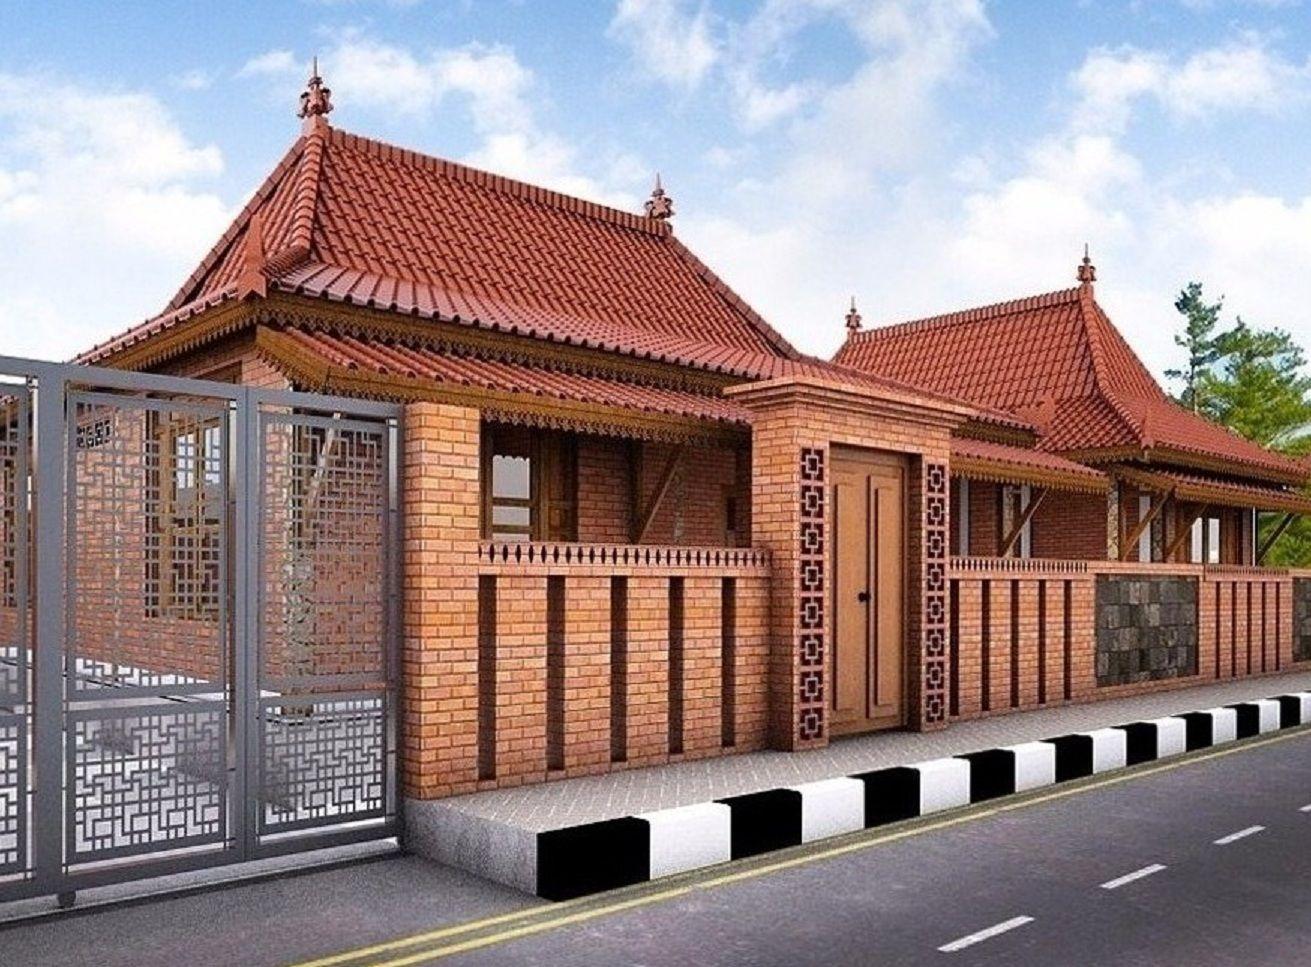 Contoh Desain Rumah Limasan 5 Kamar Tidur Desain Rumah Limasan